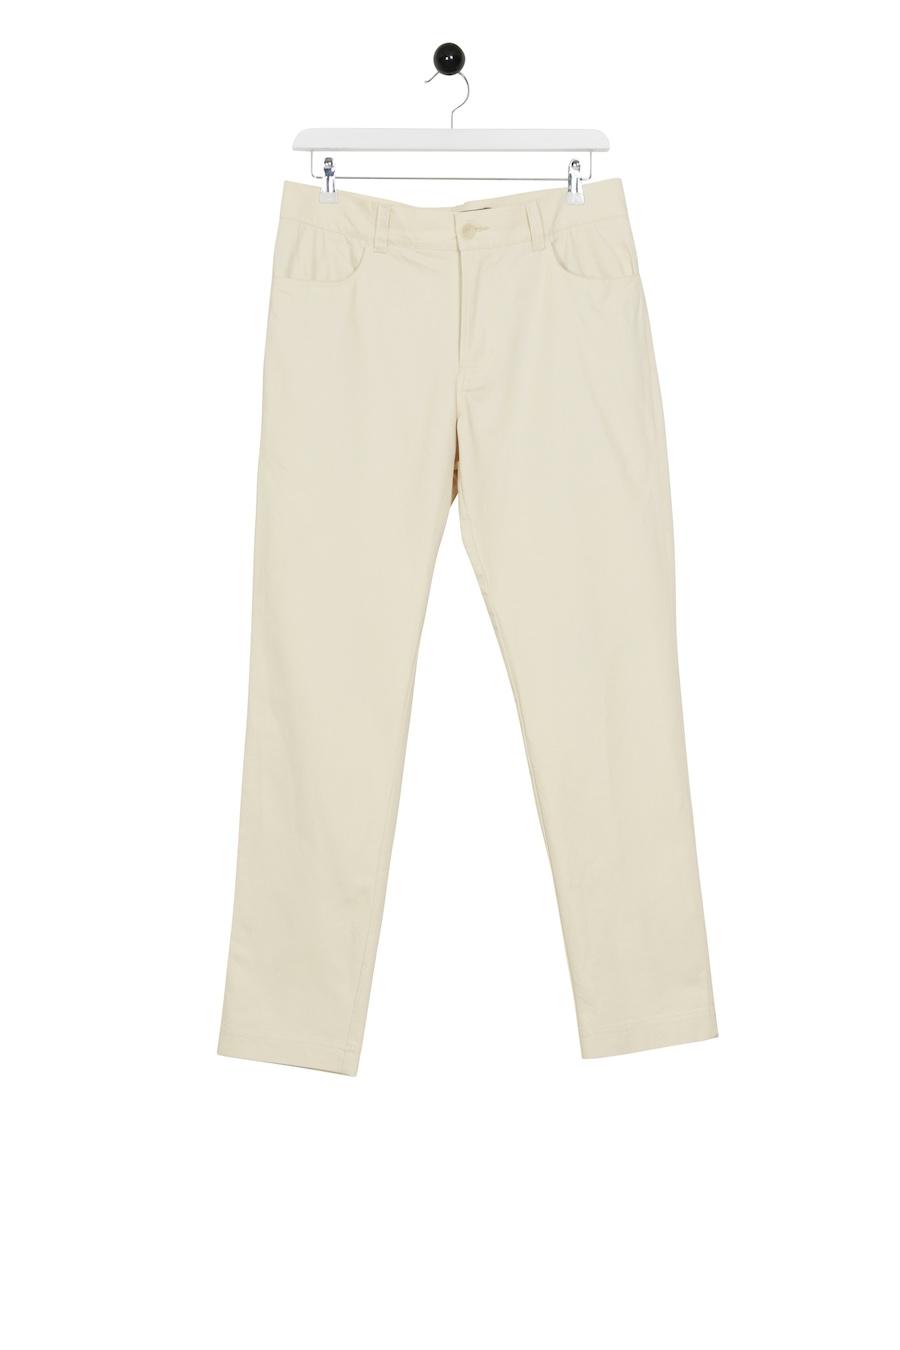 Lipizzaner Trousers